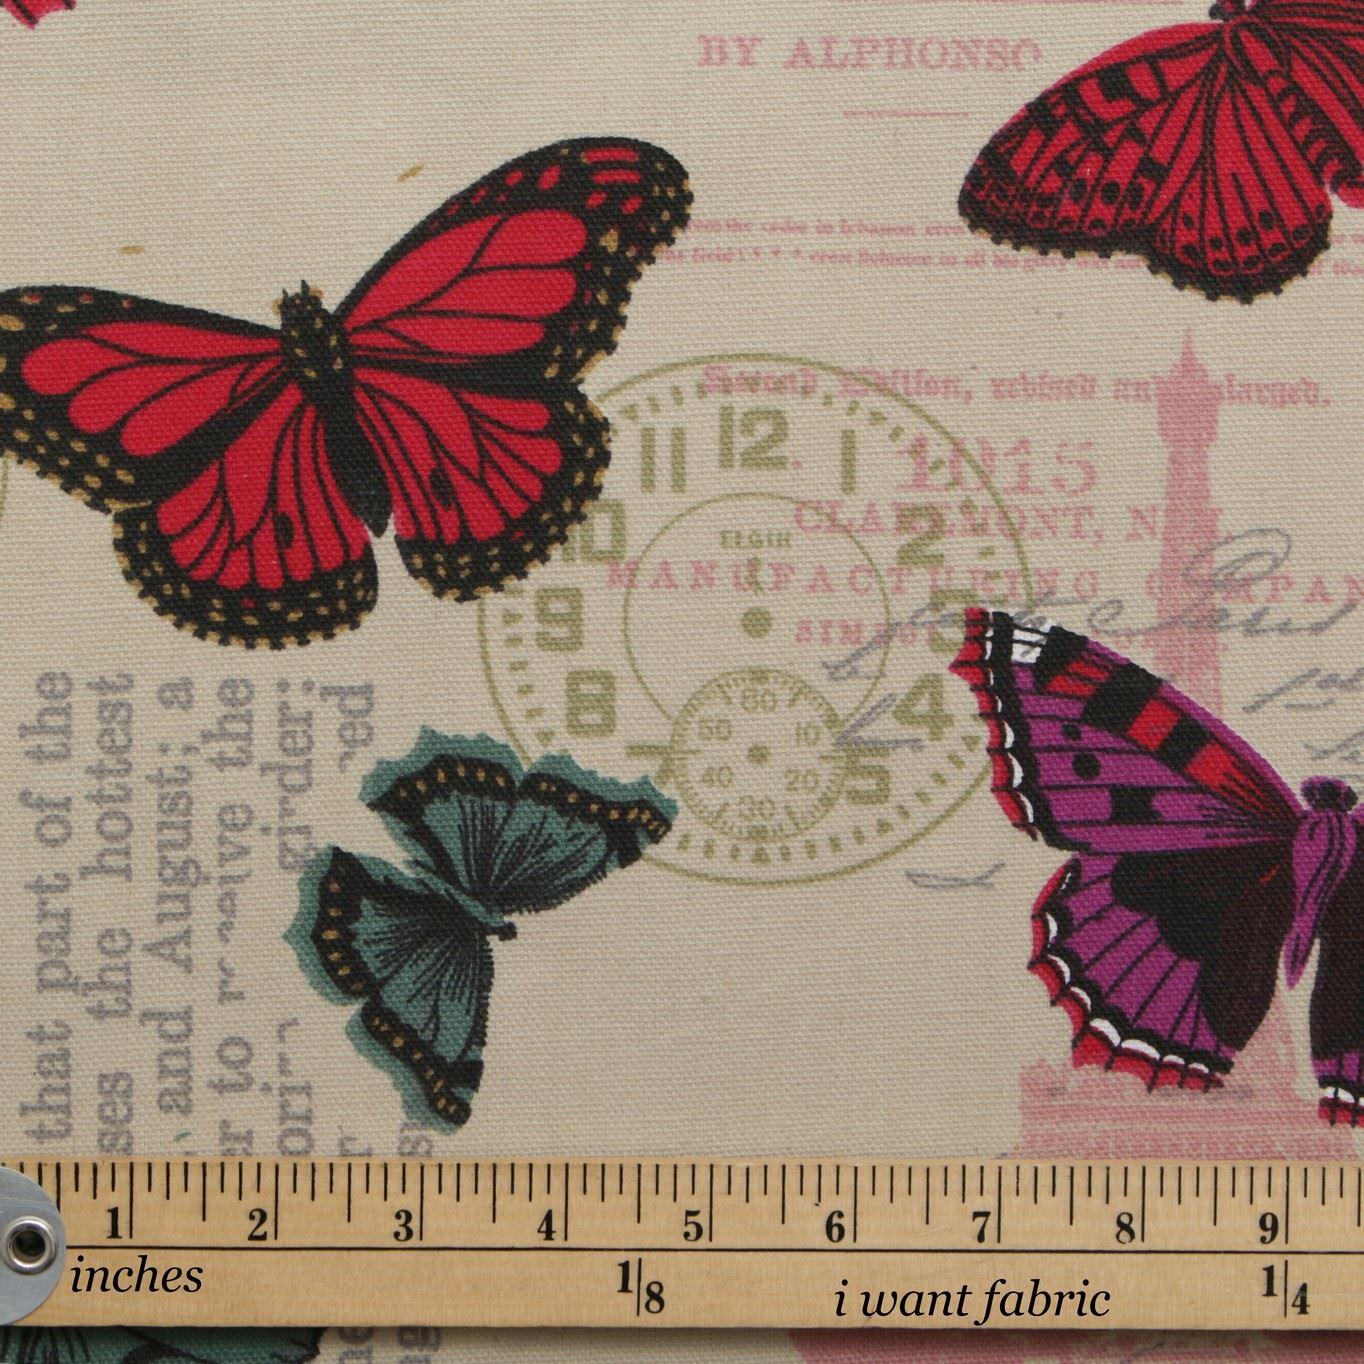 thumbnail 64 - 100% Heavy Cotton Panama Printed Childrens Curtain Cushion Upholstery Fabric